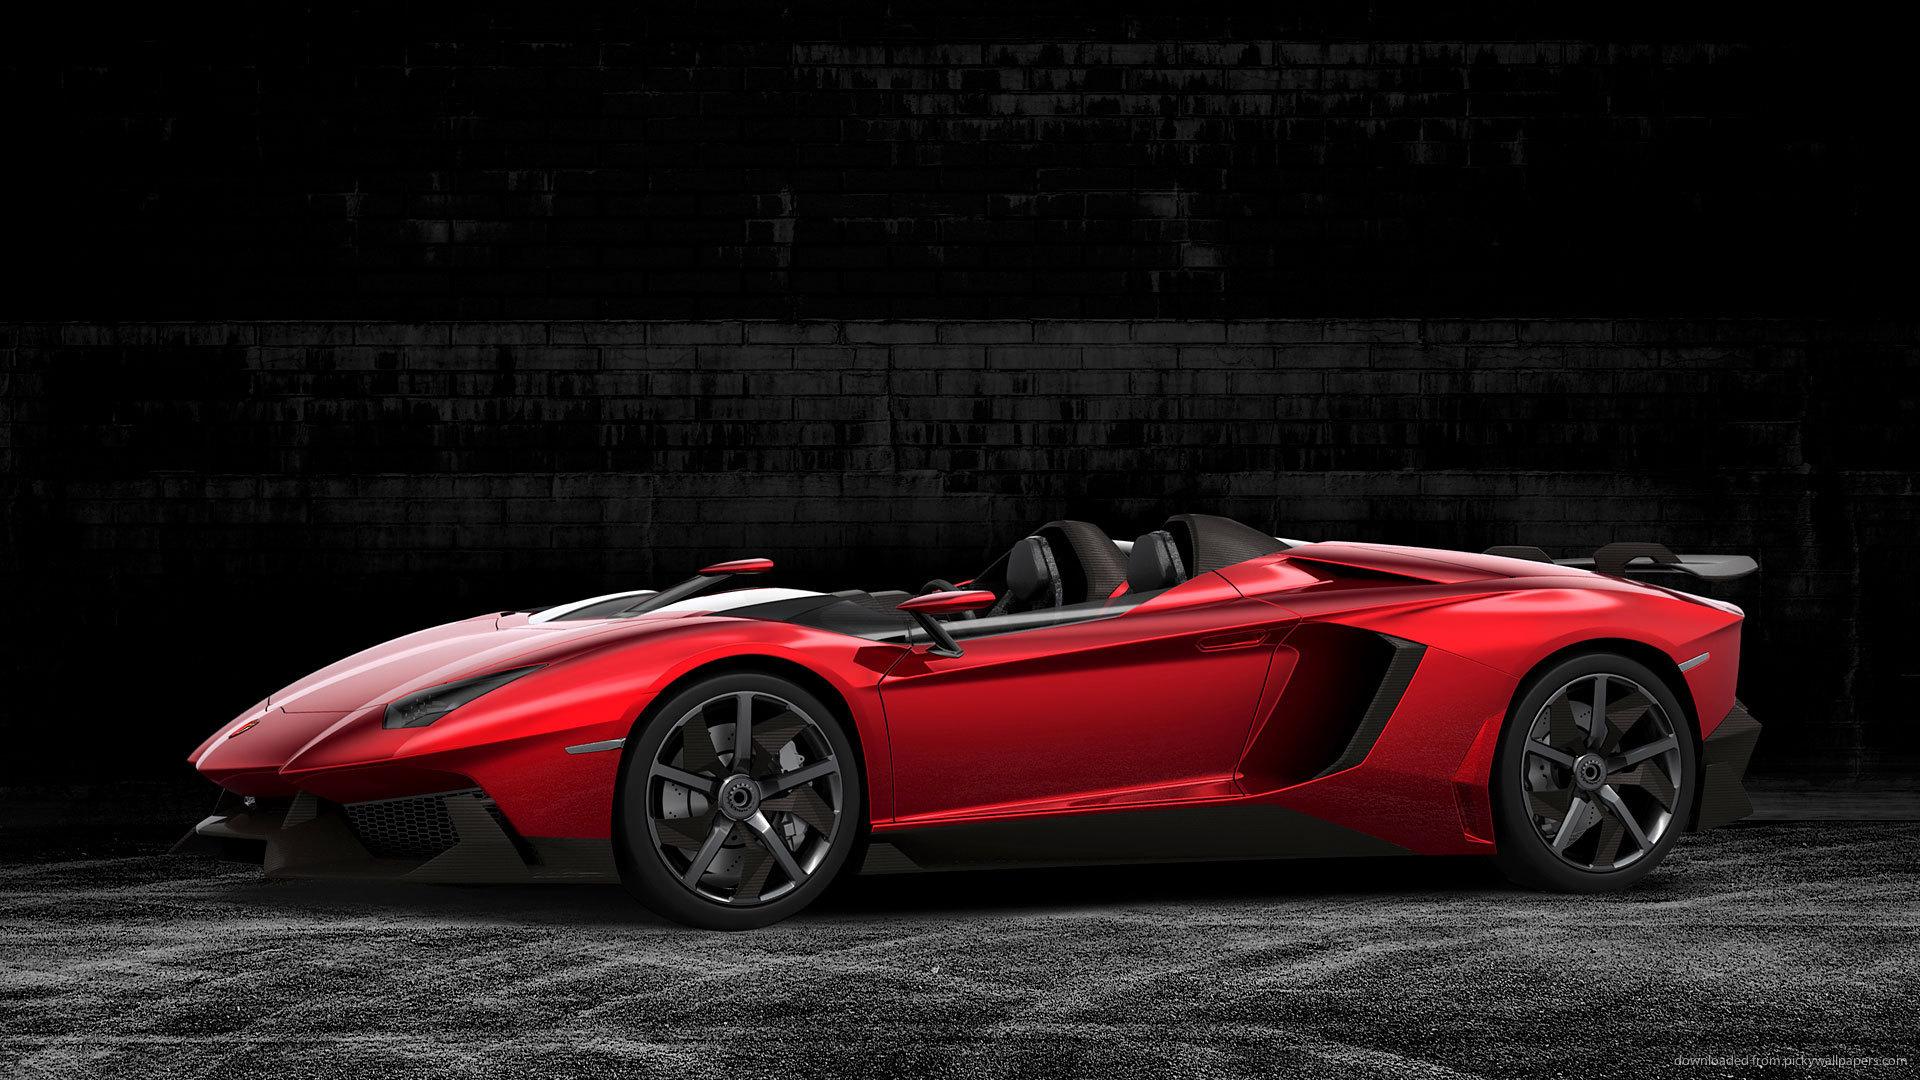 Lamborghini Aventador Roadster Wallpaper For Background